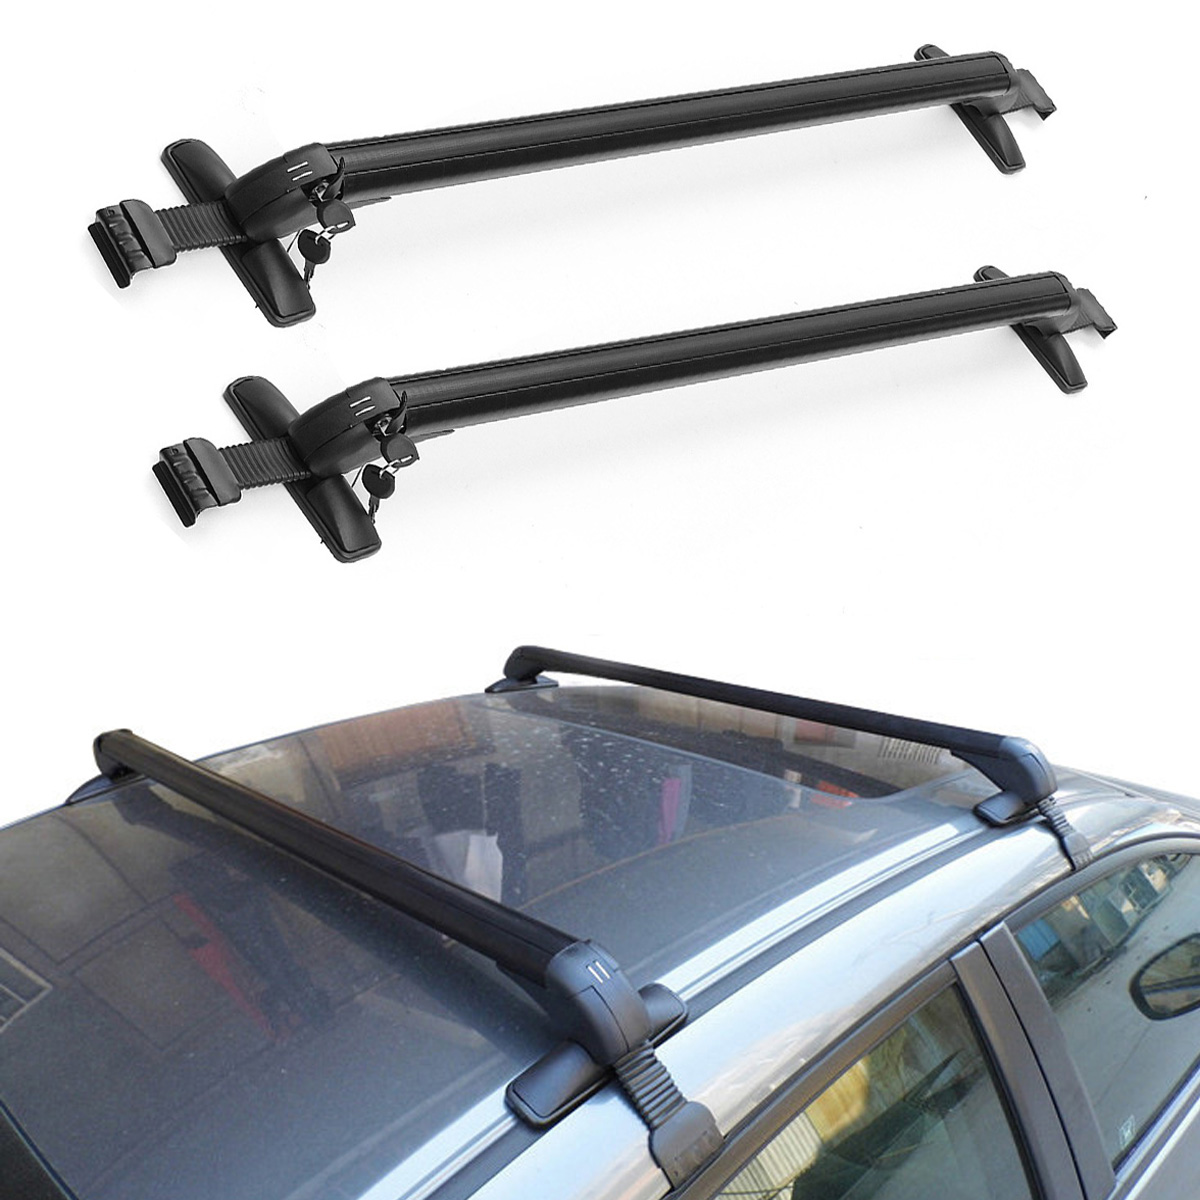 2 Pcs 48 Inch Universal Luggage Cross Bar Car Roof Bars Lockable Anti Theft For SUV With Rails Rack Locking Bar